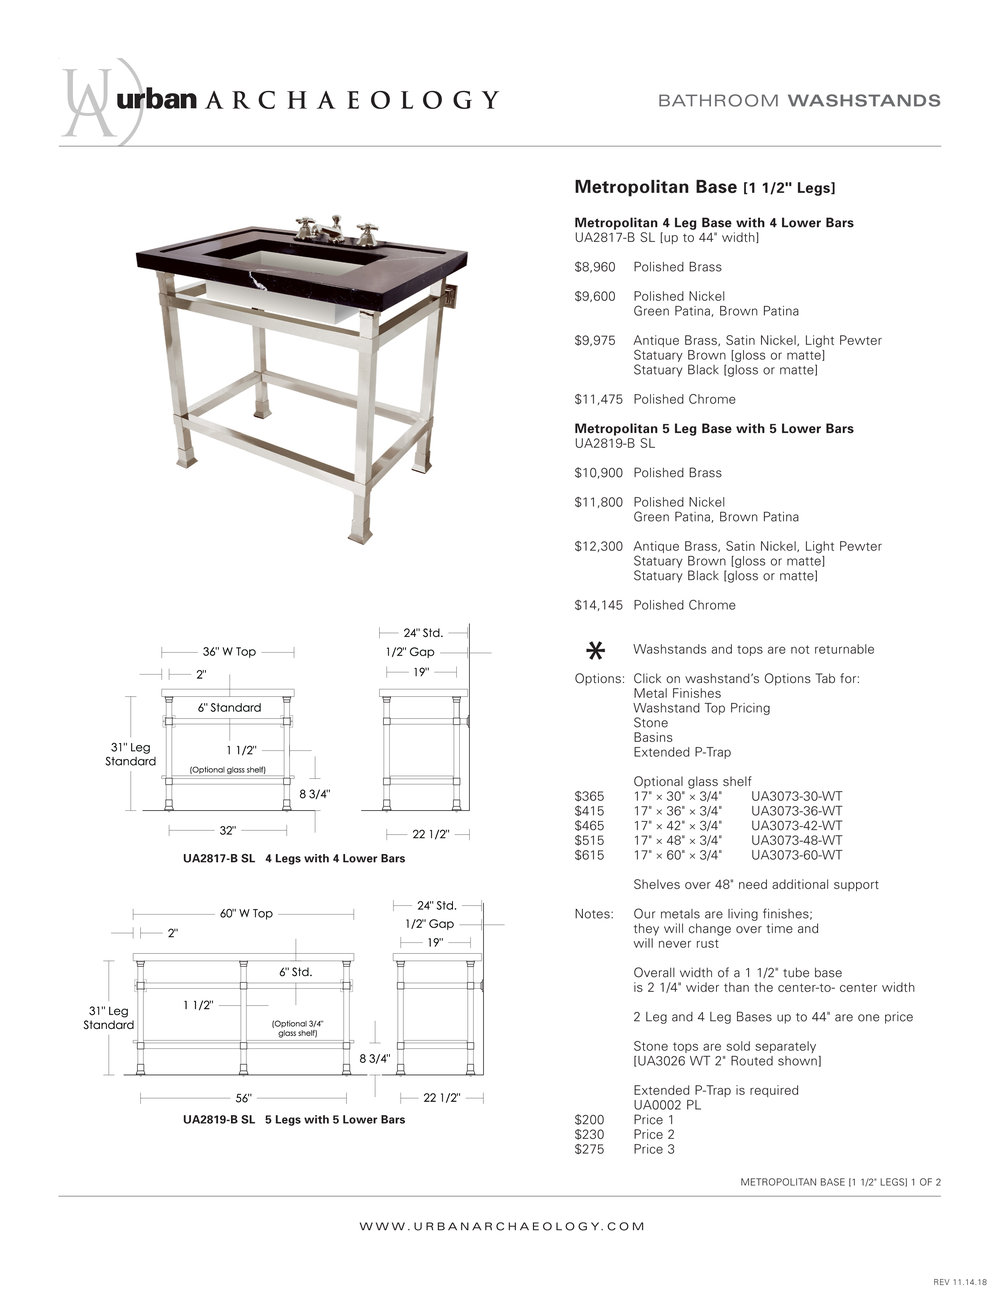 UA Metropolitan 4 Leg Washstand spec sheet-1.jpg